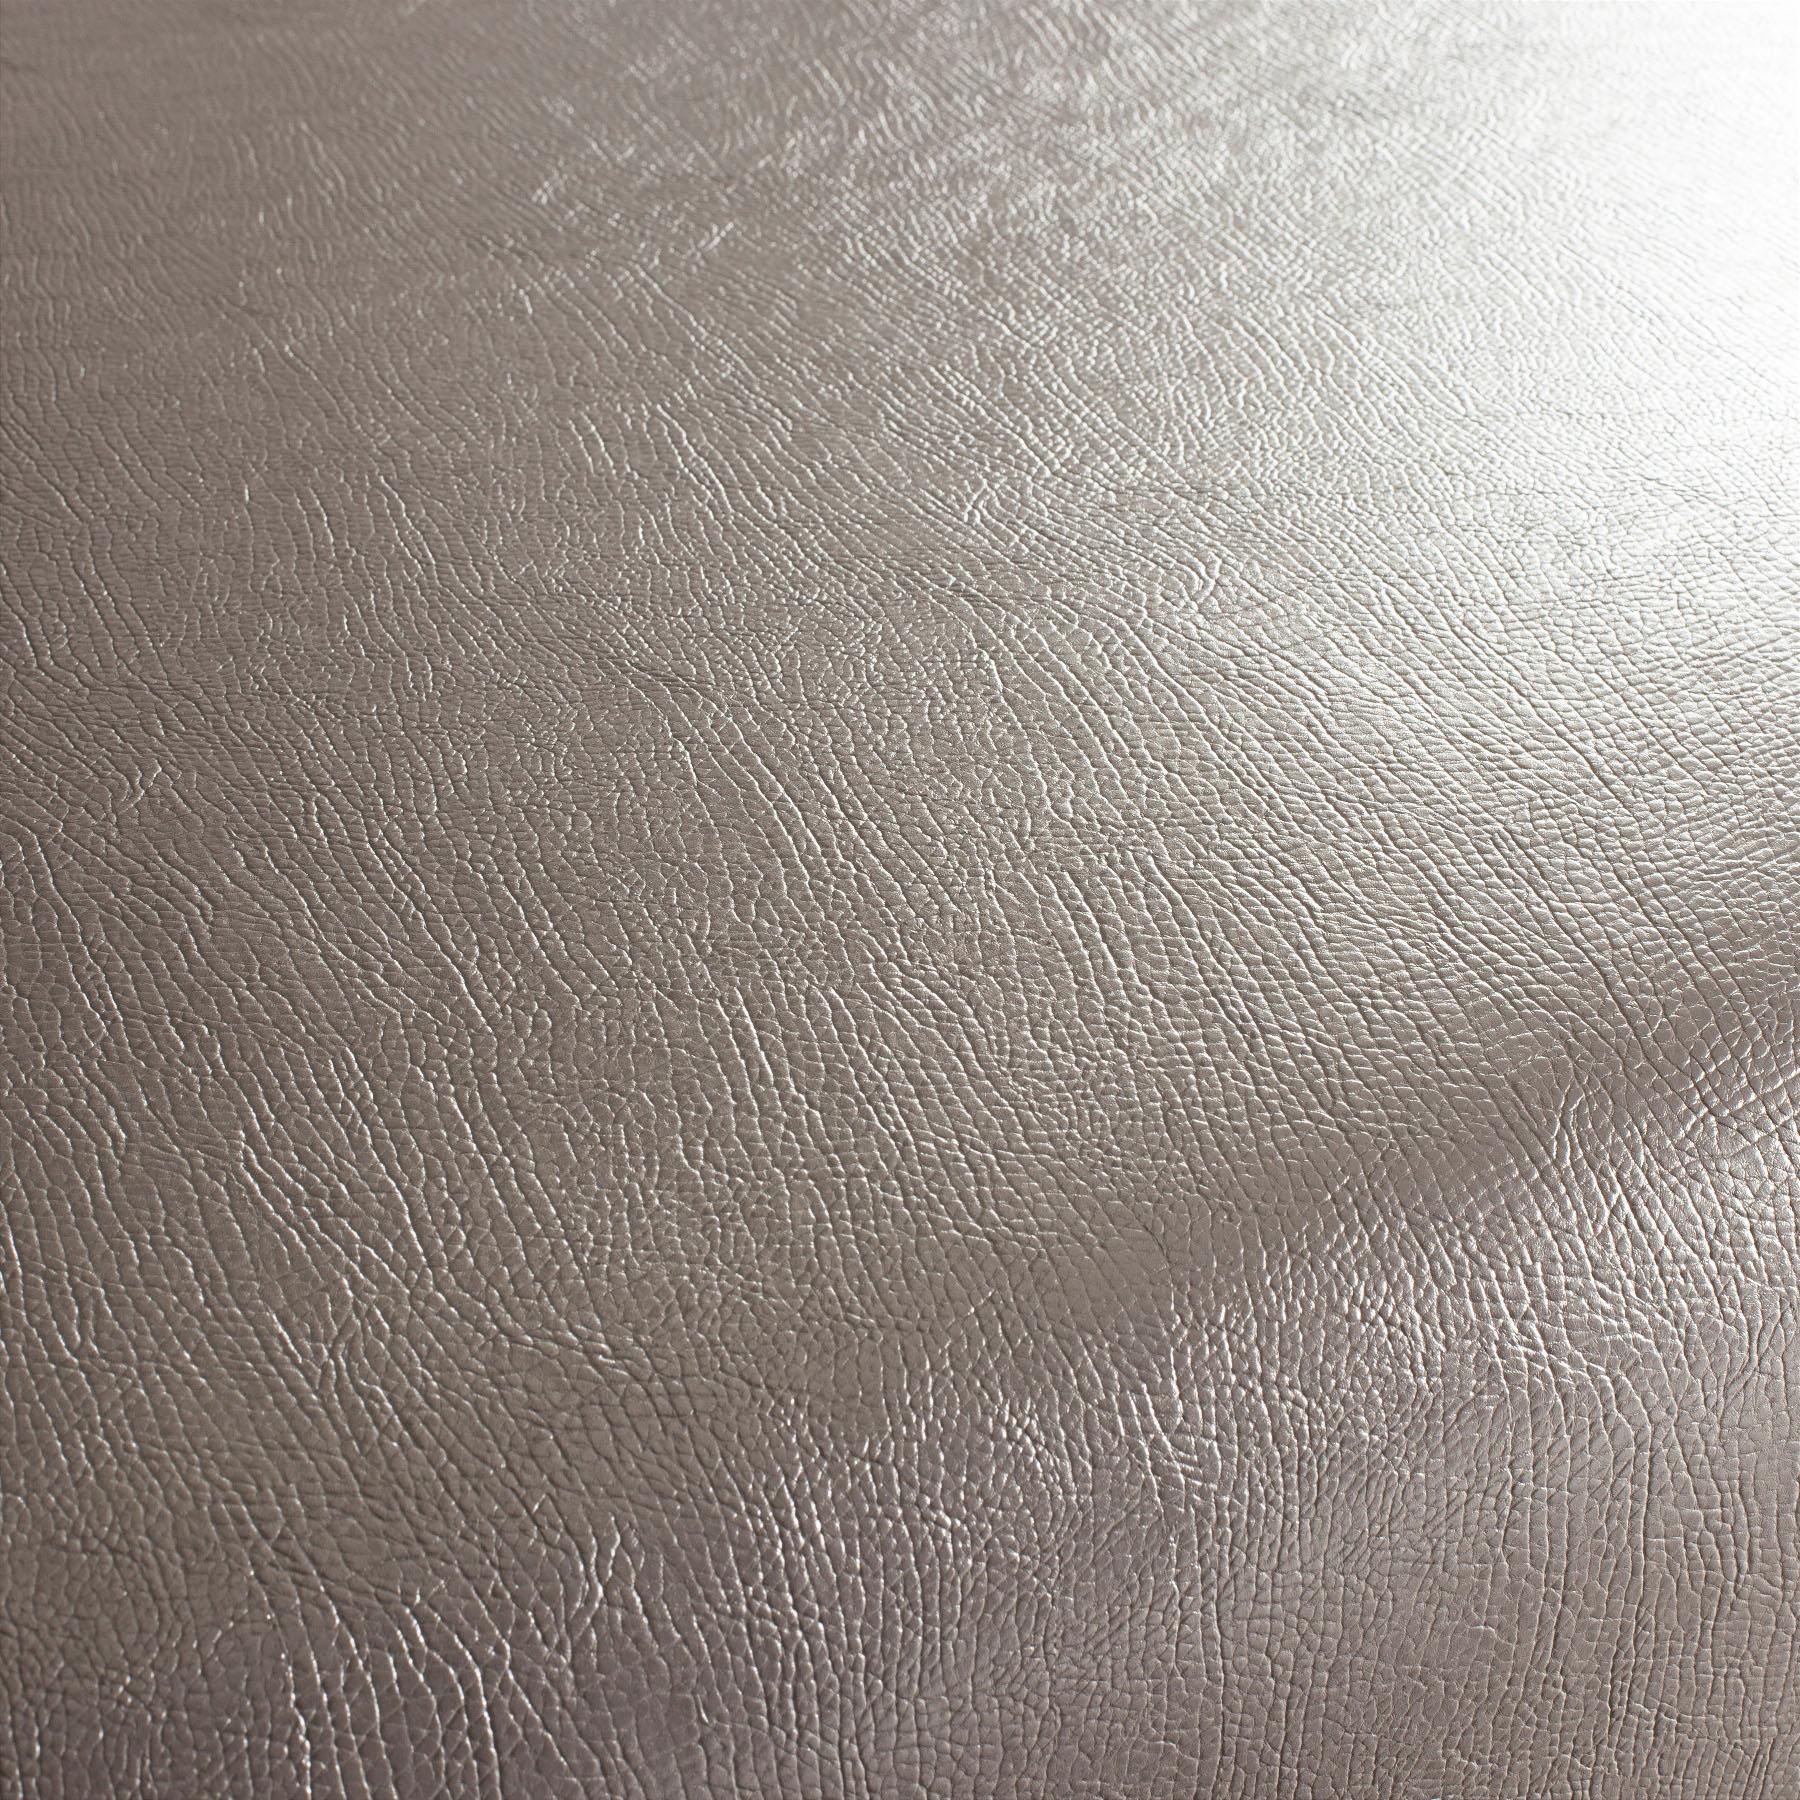 Upholstery Fabric Rocky 1 1280 024 Jab Anstoetz Fabrics